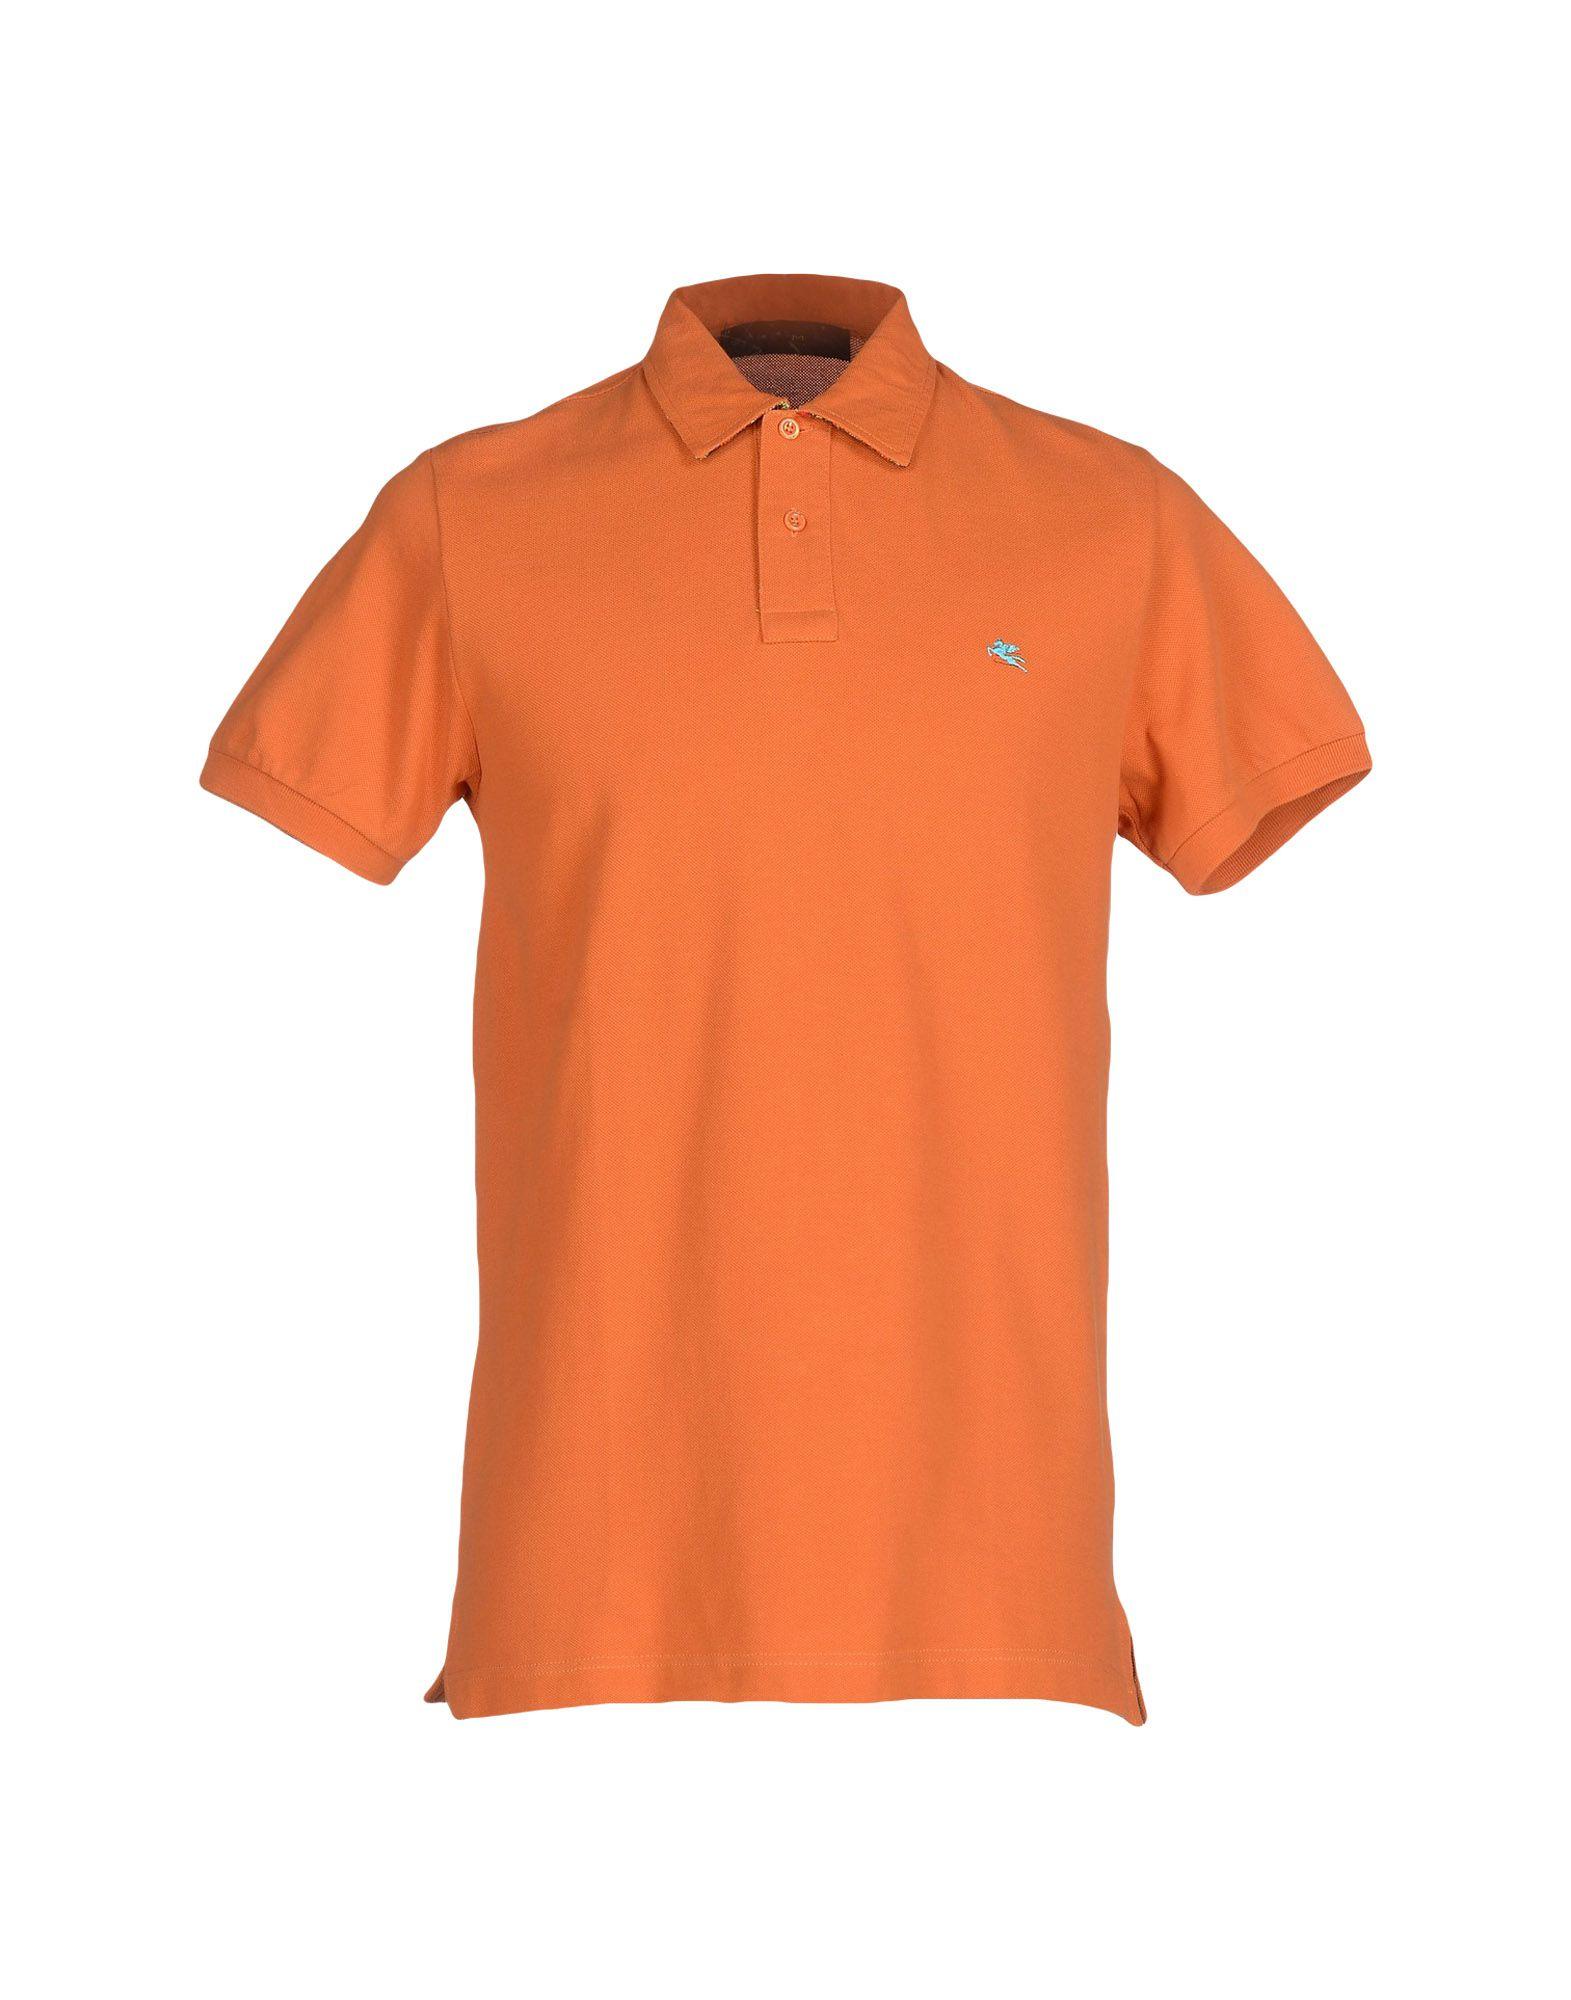 Etro polo shirt in orange for men lyst for Orange polo shirt mens